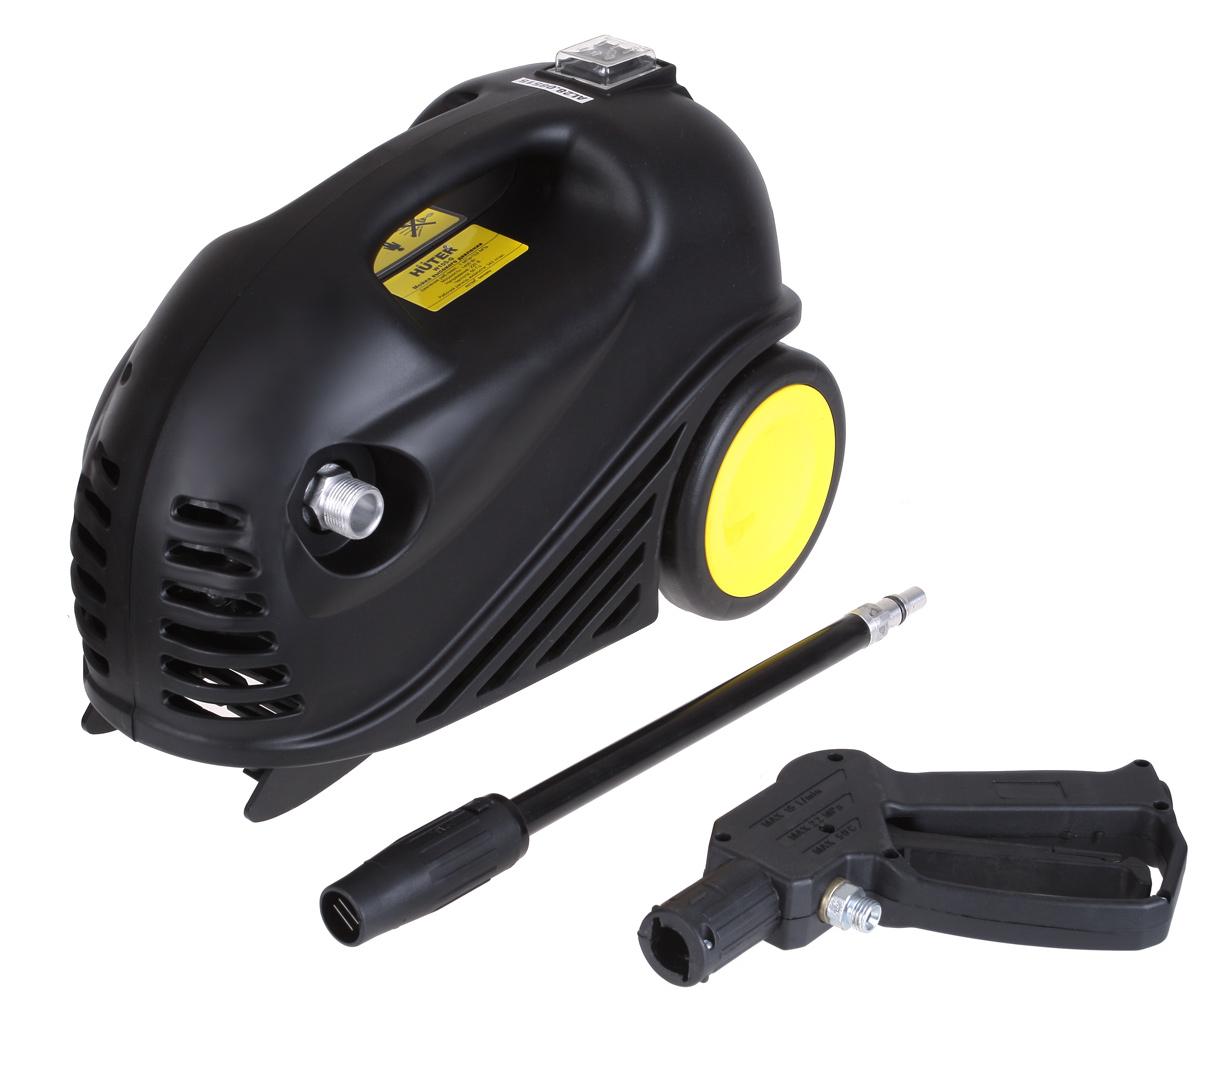 ����� �������� �������� Huter W105-g